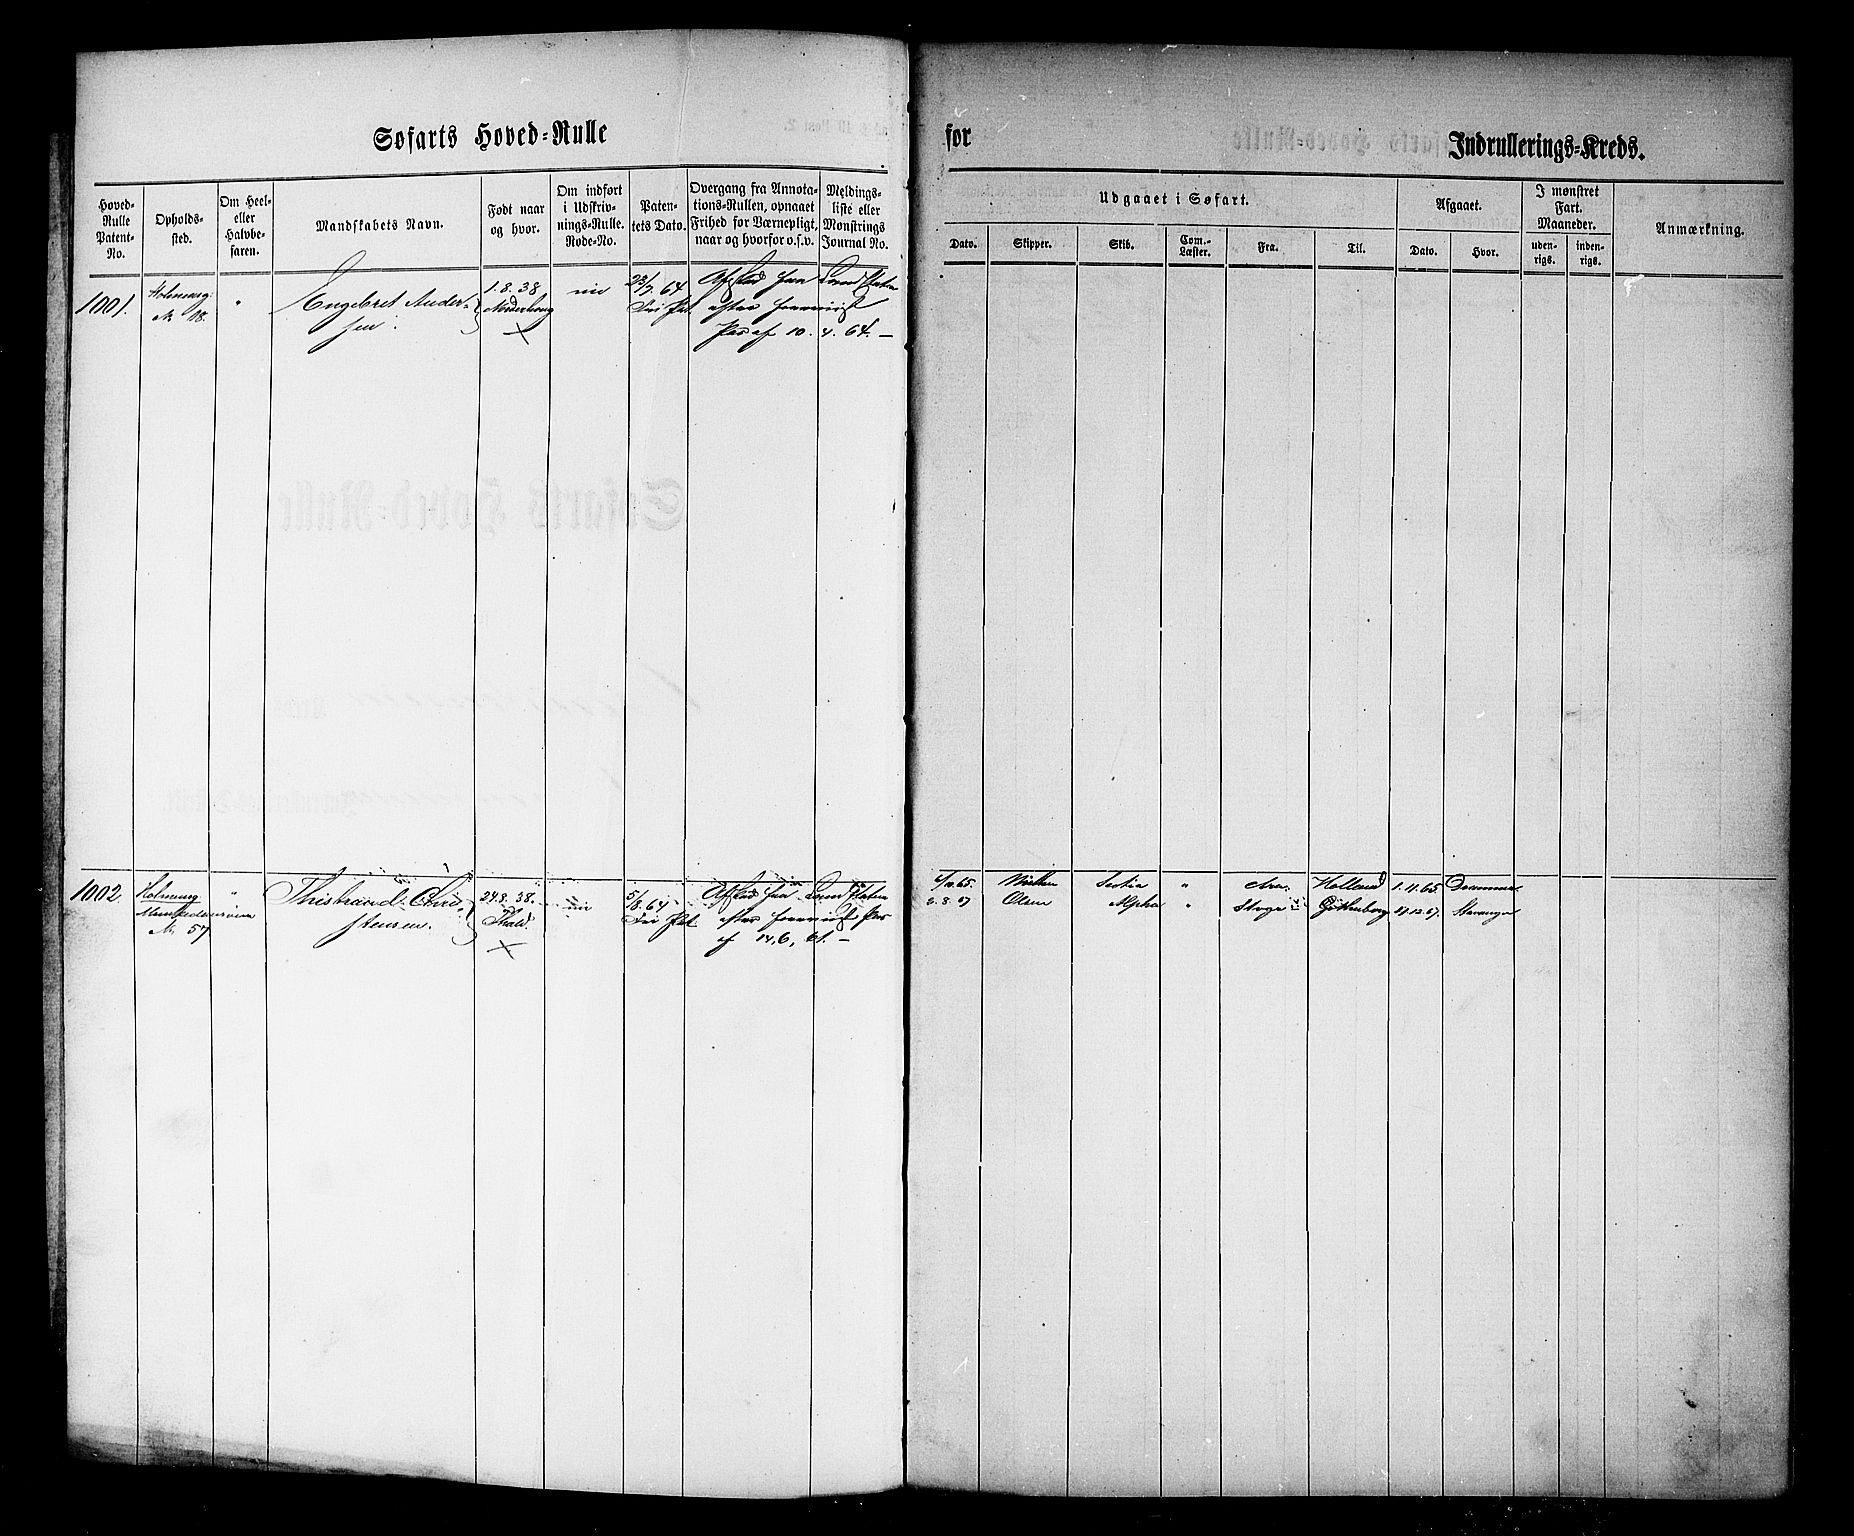 SAO, Oslo mønstringskontor, F/Fc/Fcb/L0002: Hovedrulle, 1864, s. 1